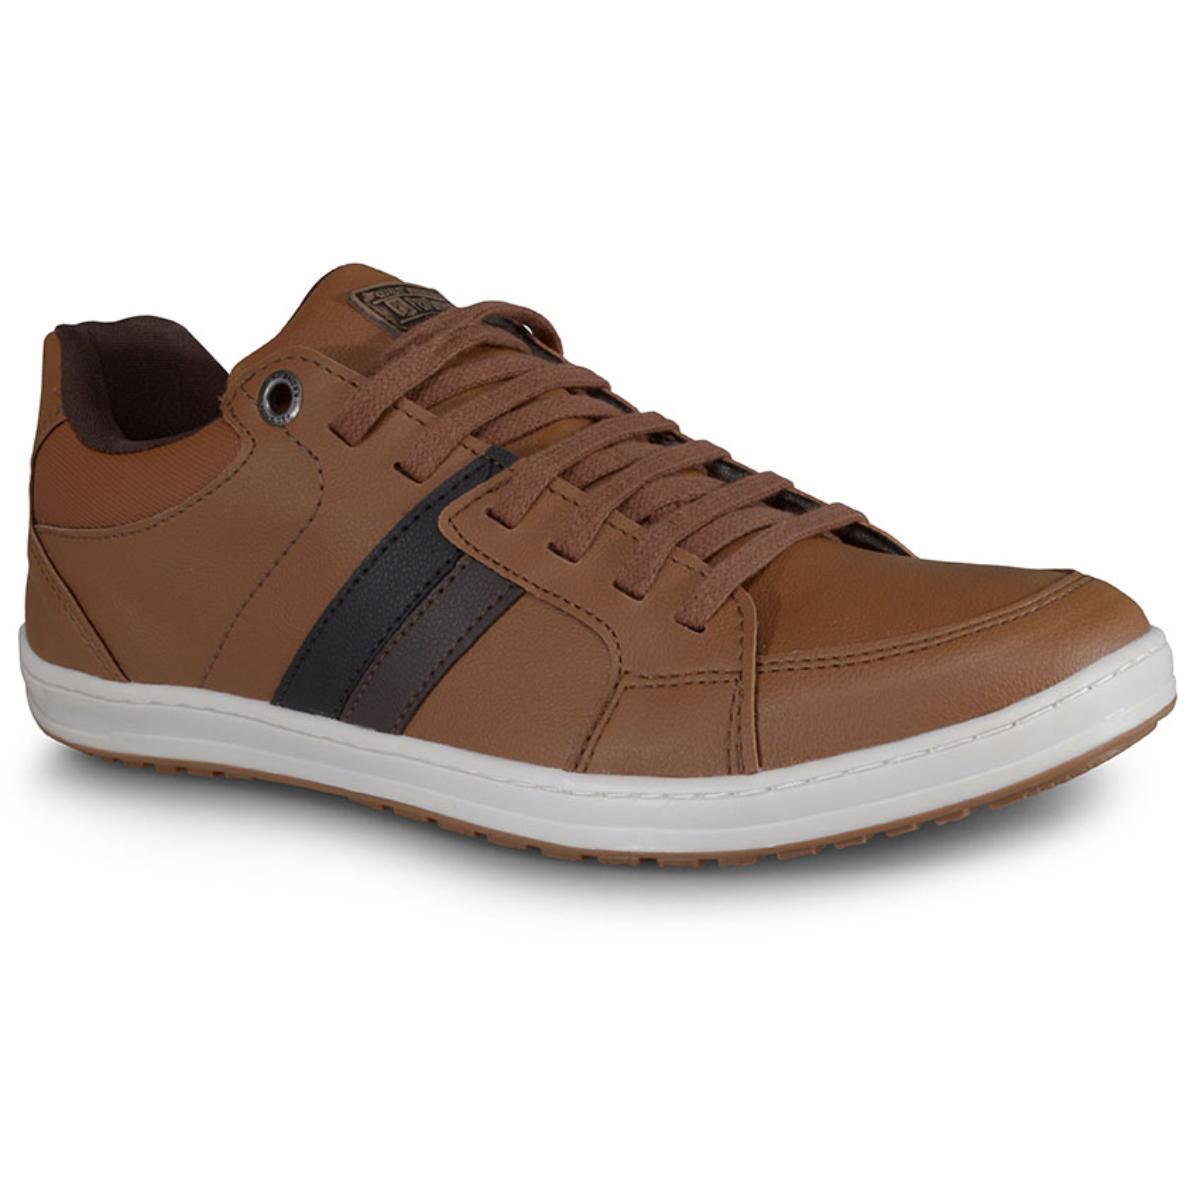 Sapatênis Masculino Ped Shoes 14008 Camel/café Kit Cinto+meia